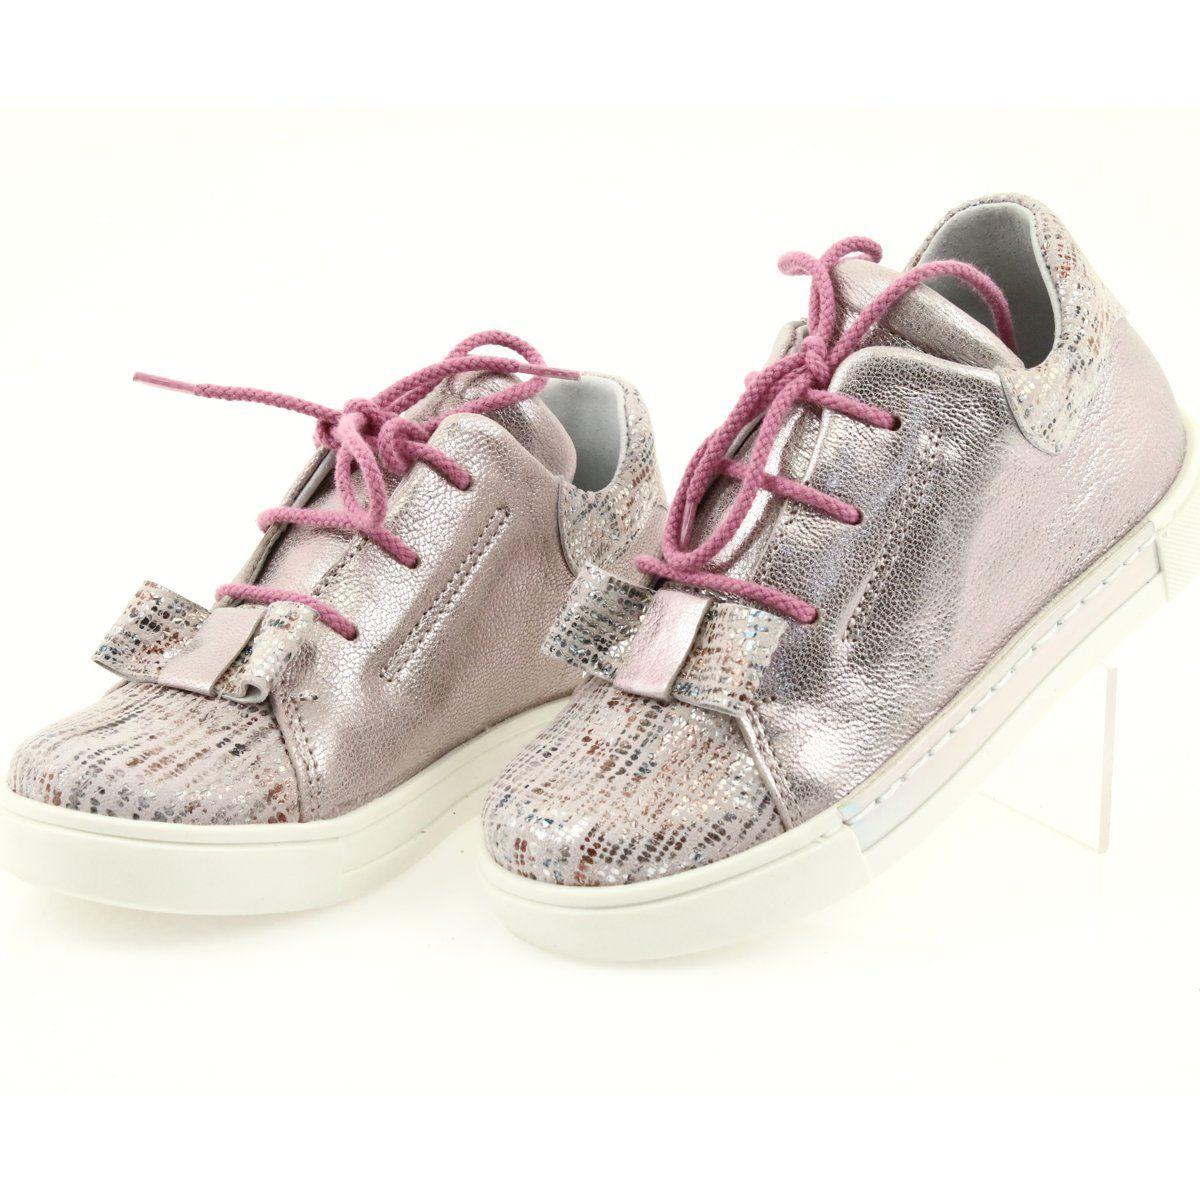 Buty Skorzane Sportowe Ren But 3303 Perlowy Roz Rozowe Shoes Leather Shoes Childrens Shoes